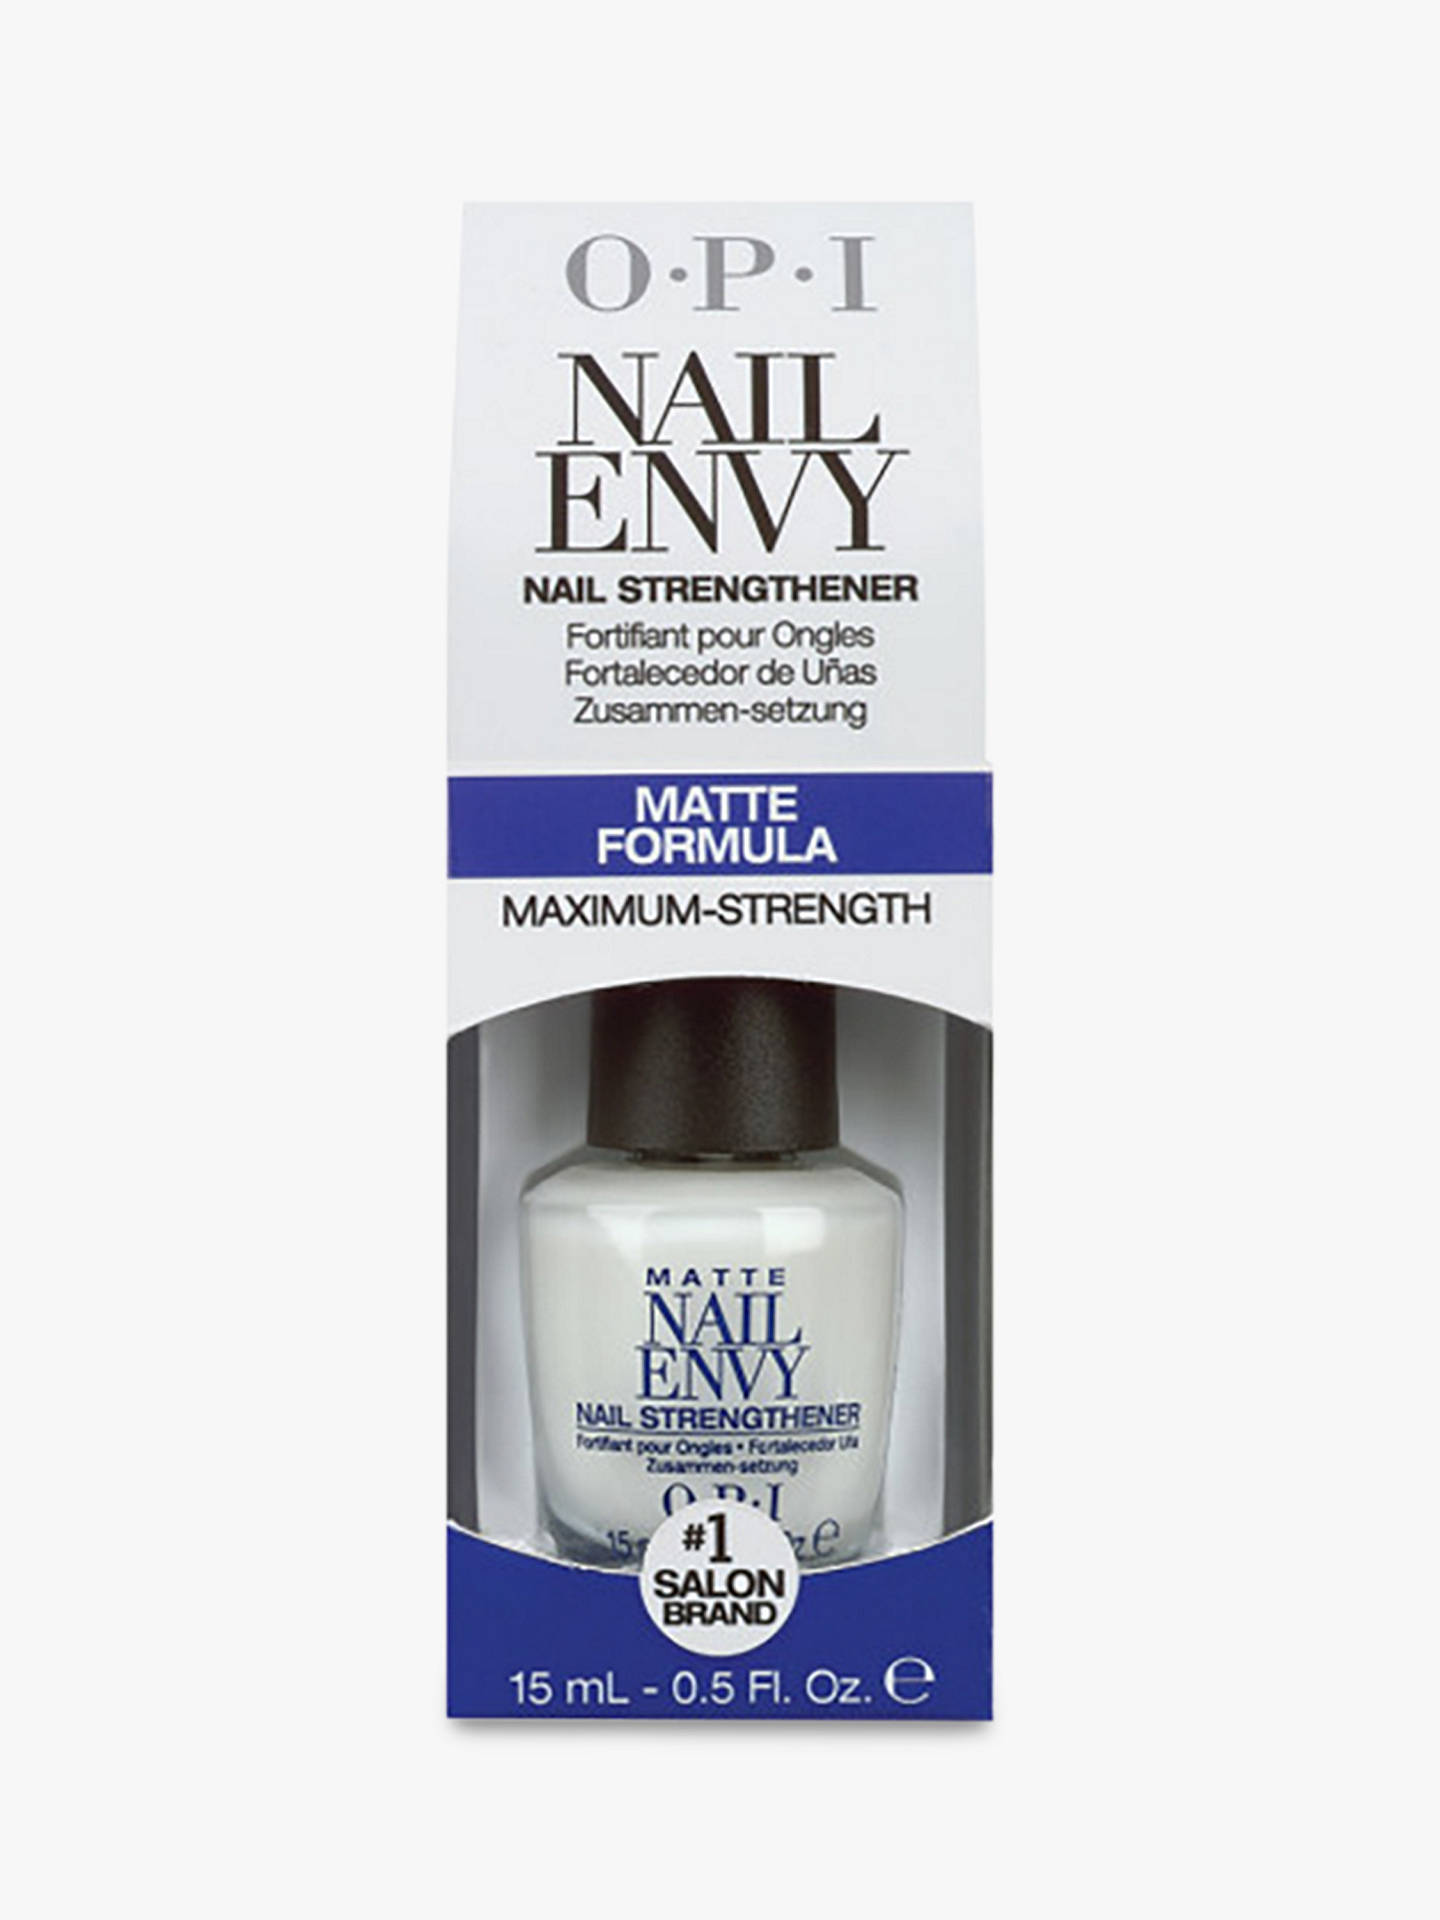 OPI Matte Nail Envy Strengthener, 15ml at John Lewis & Partners